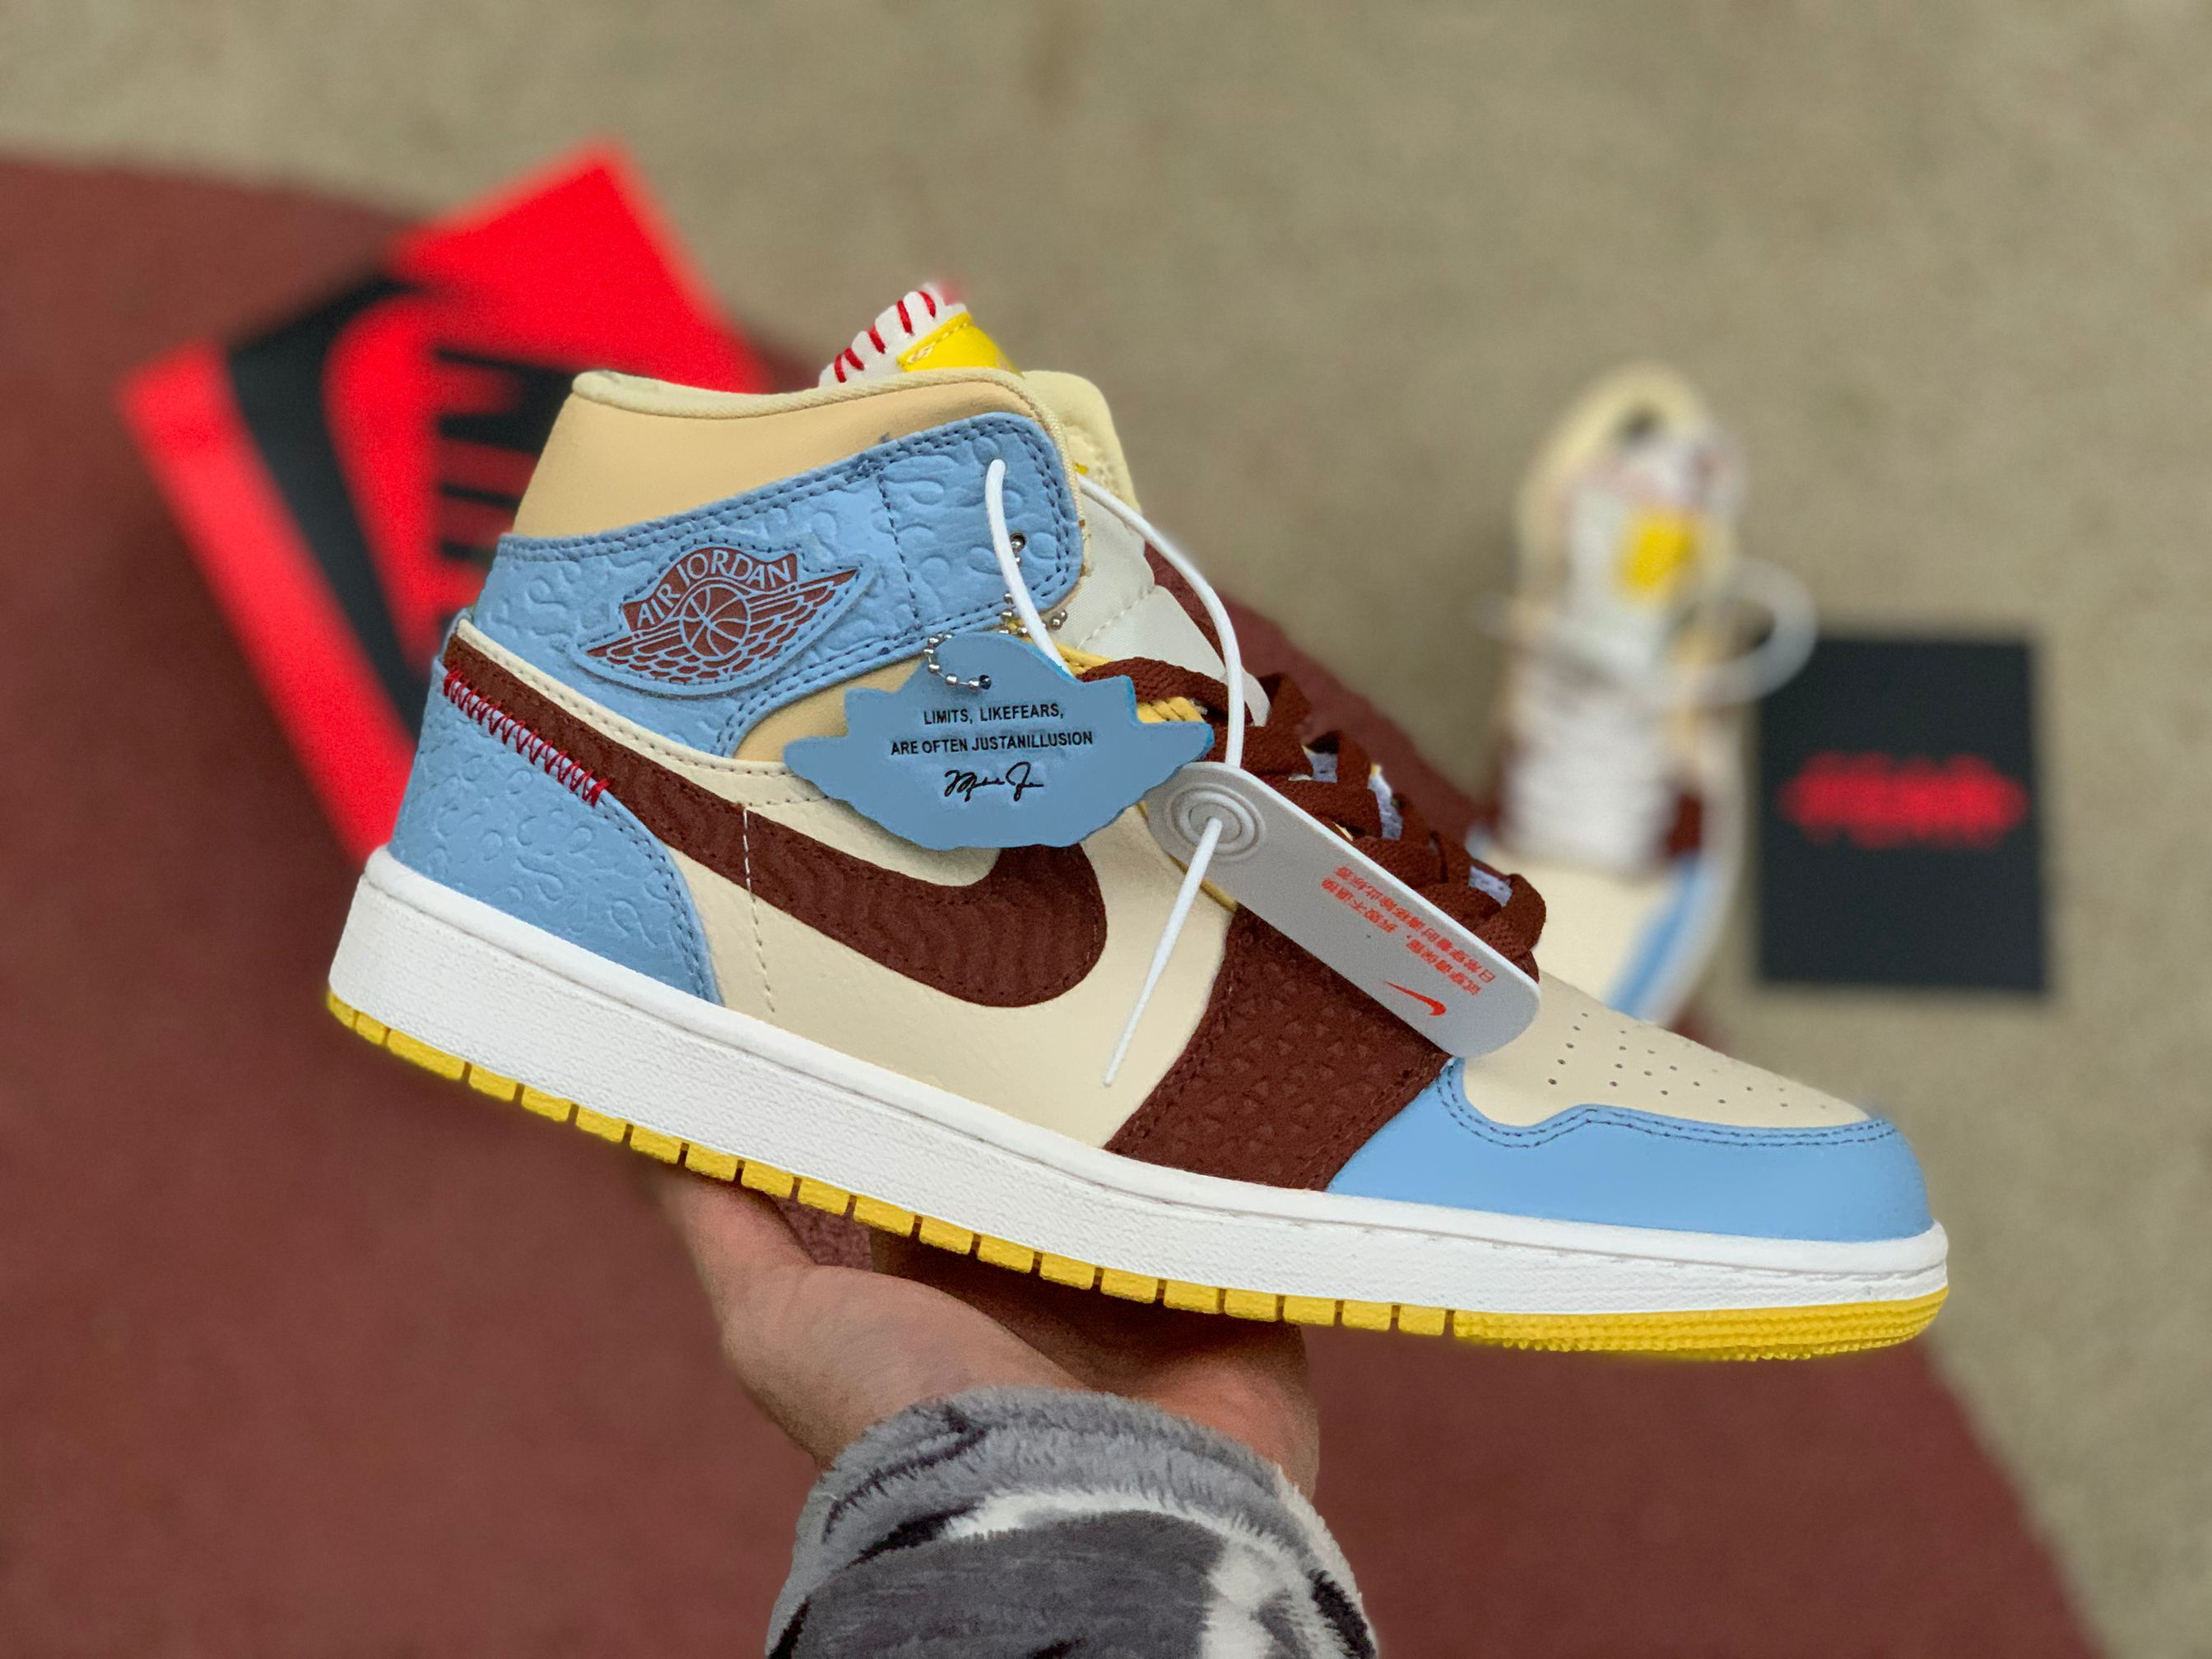 Zapatos de baloncesto aj1mid estilo africano Air Jordan 1 Mid Fearless Maison estilo africano talla CU2803-200 36-46